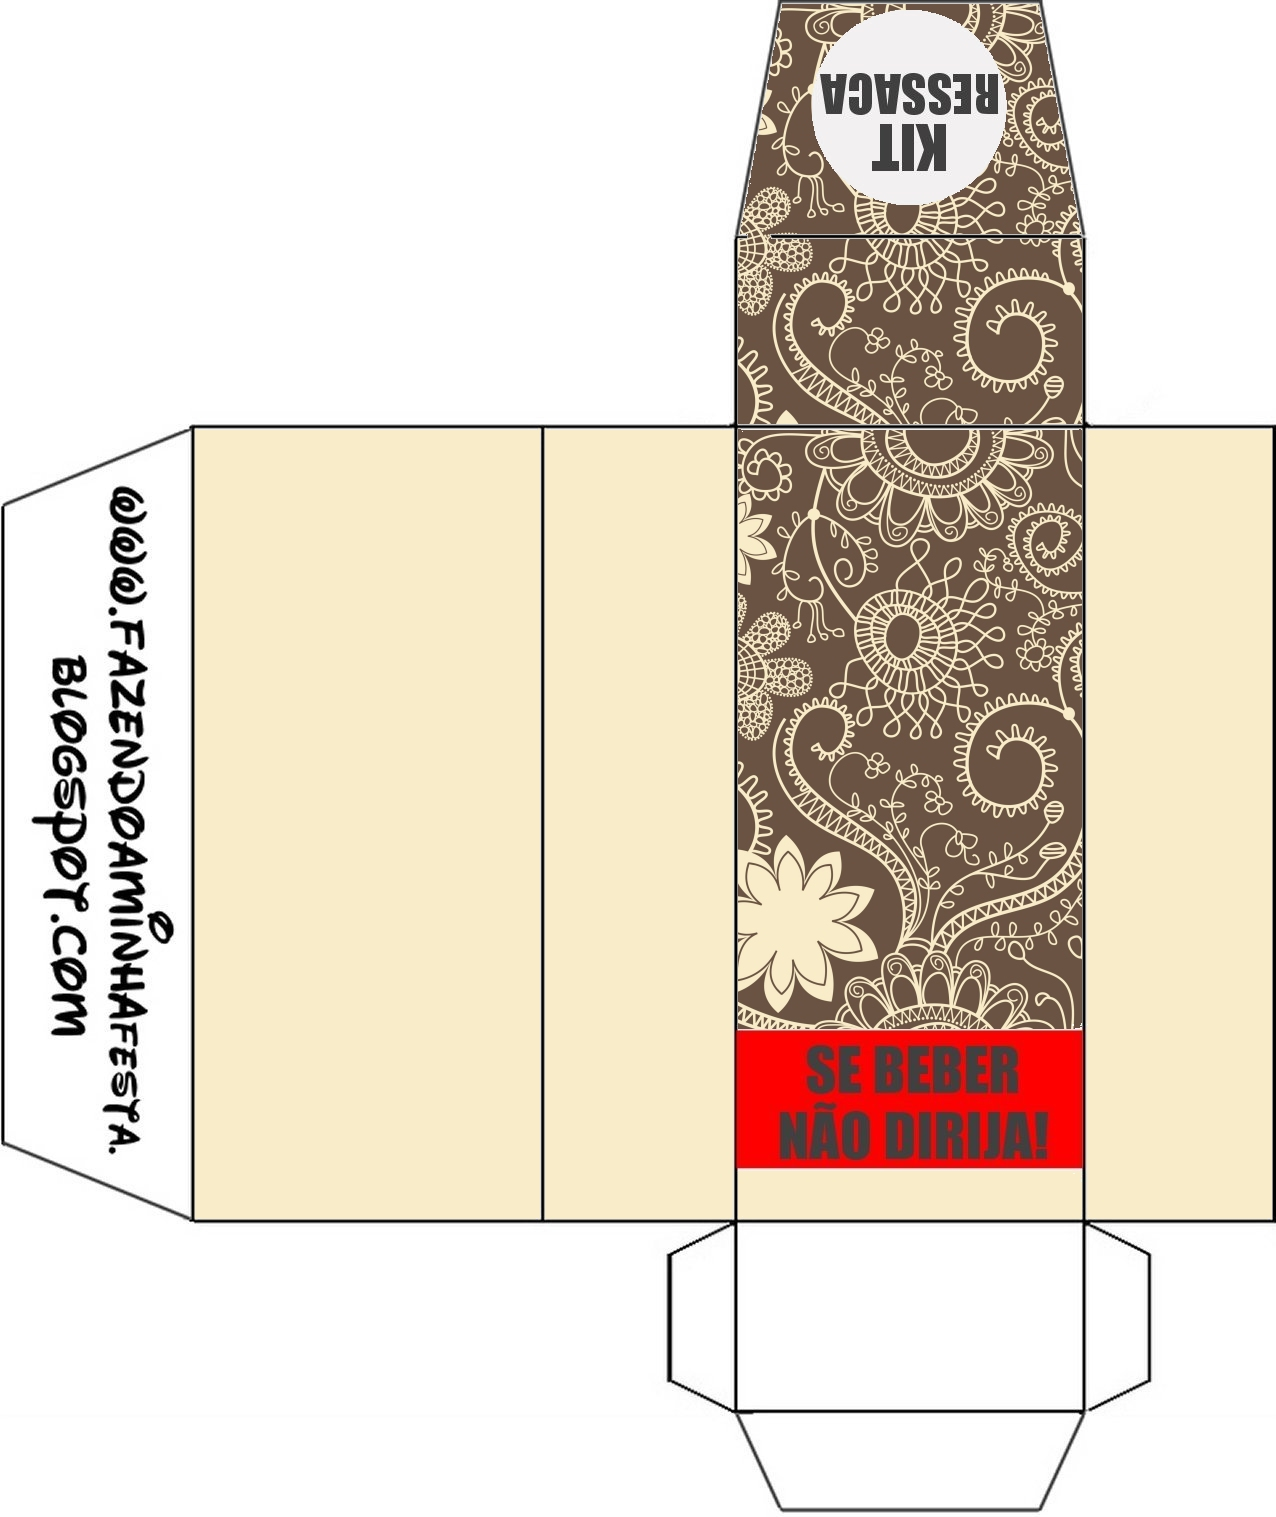 Kit Toilet – Banheiro Marrom e Bege #C60505 1276 1517